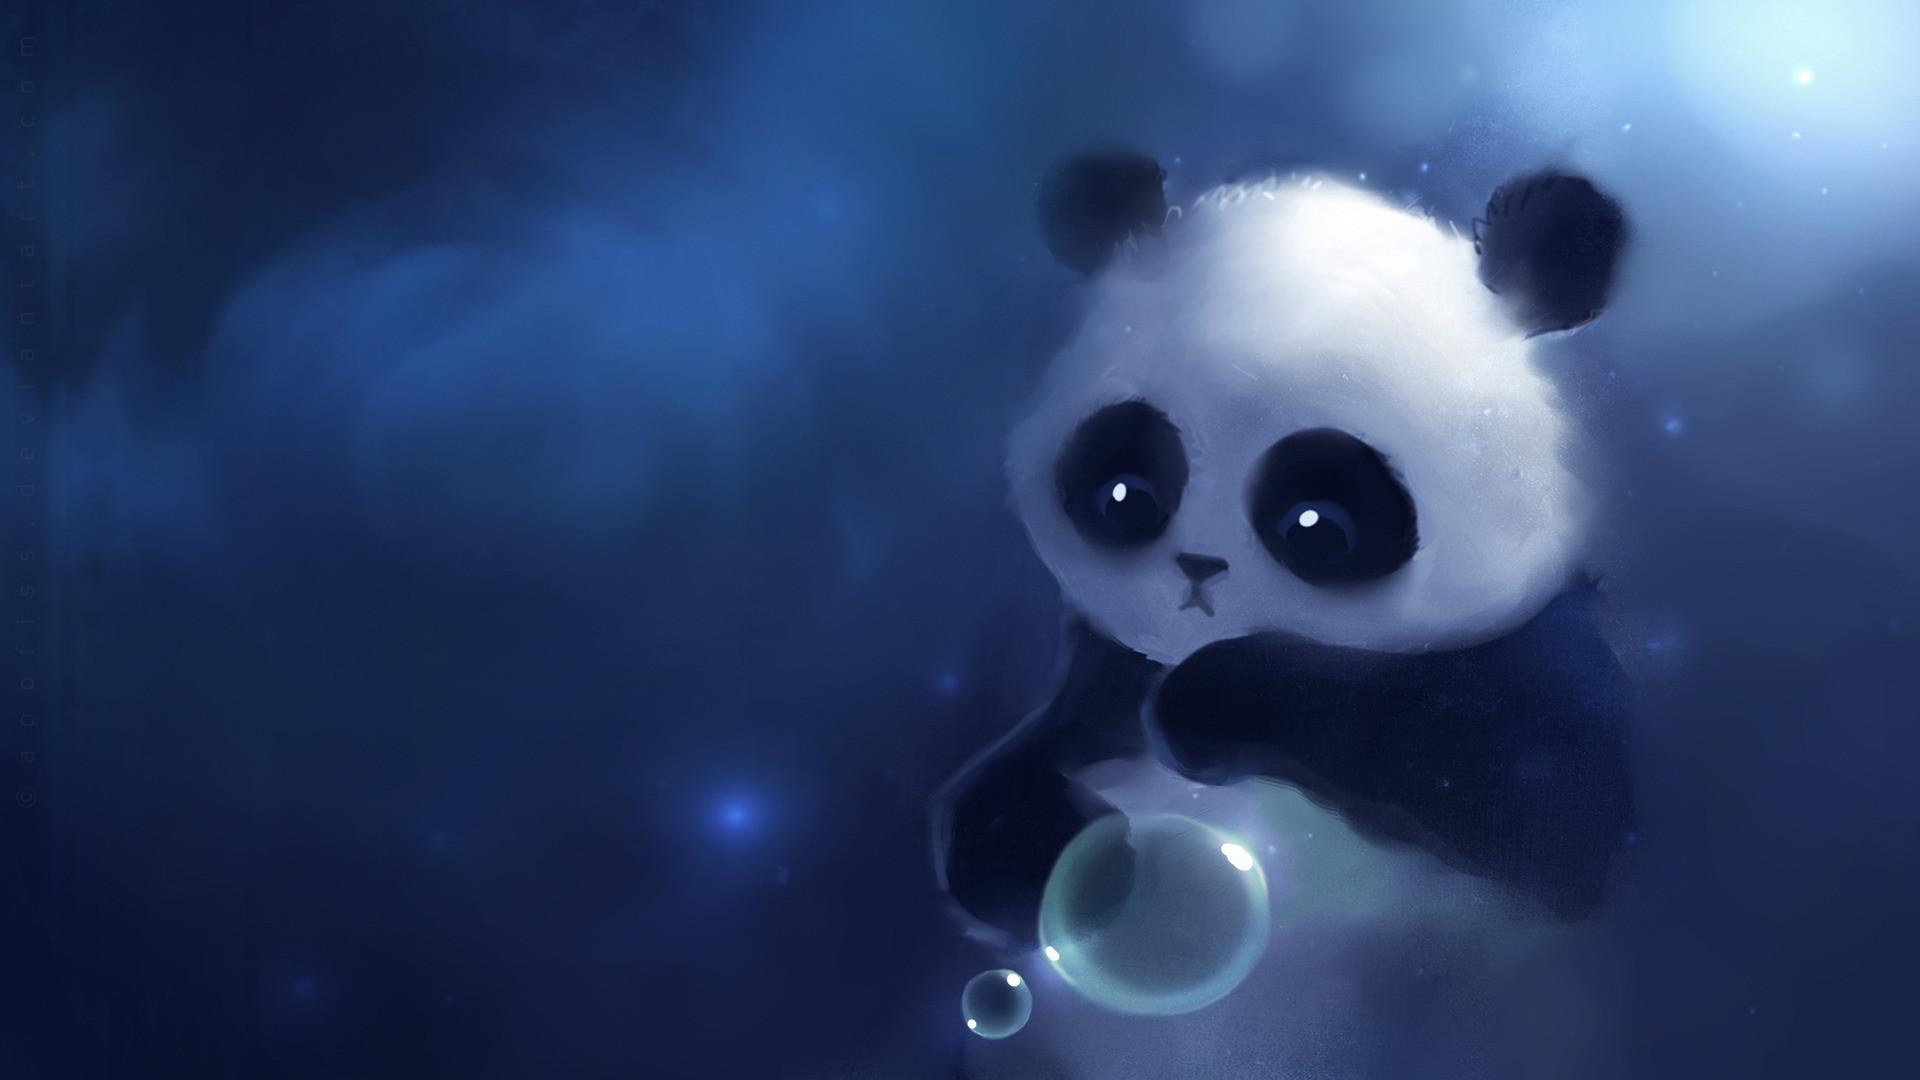 anime panda wallpaper high resolution with high resolution wallpaper on  anime category similar with 1080p 1600×900